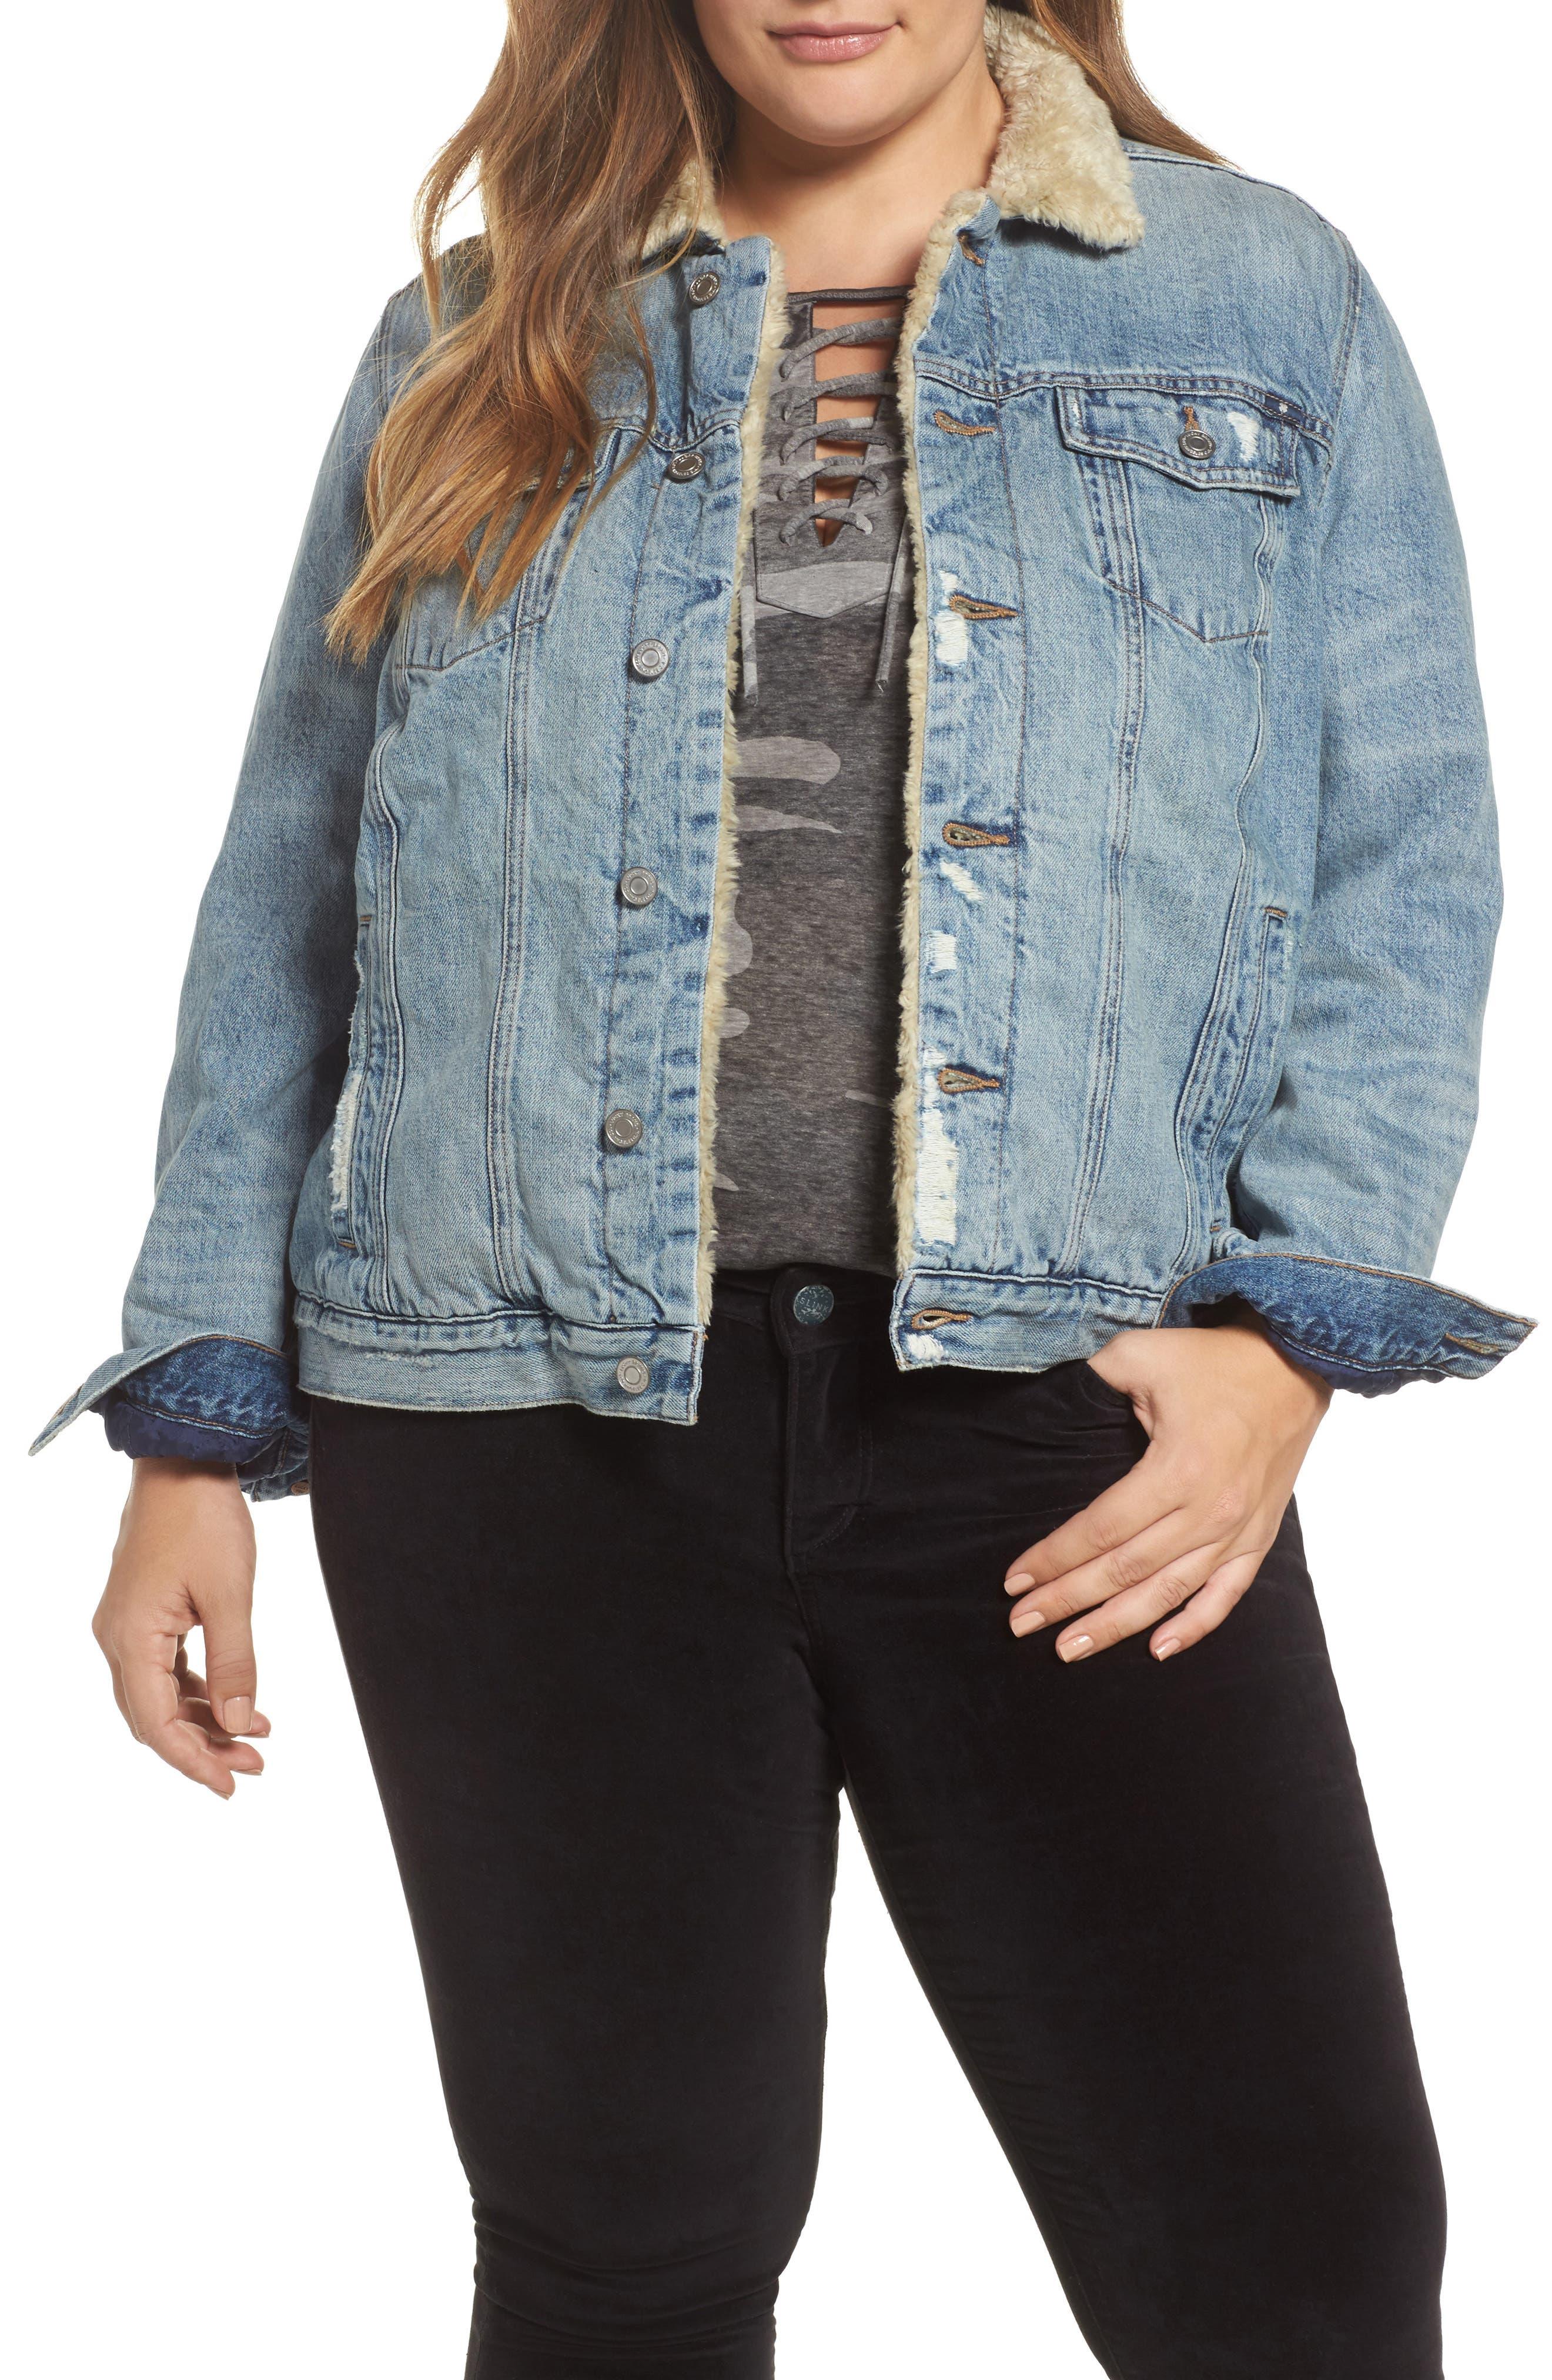 Alternate Image 1 Selected - Lucky Brand Faux Fur Collar Trucker Jacket (Wellton) (Plus Size)